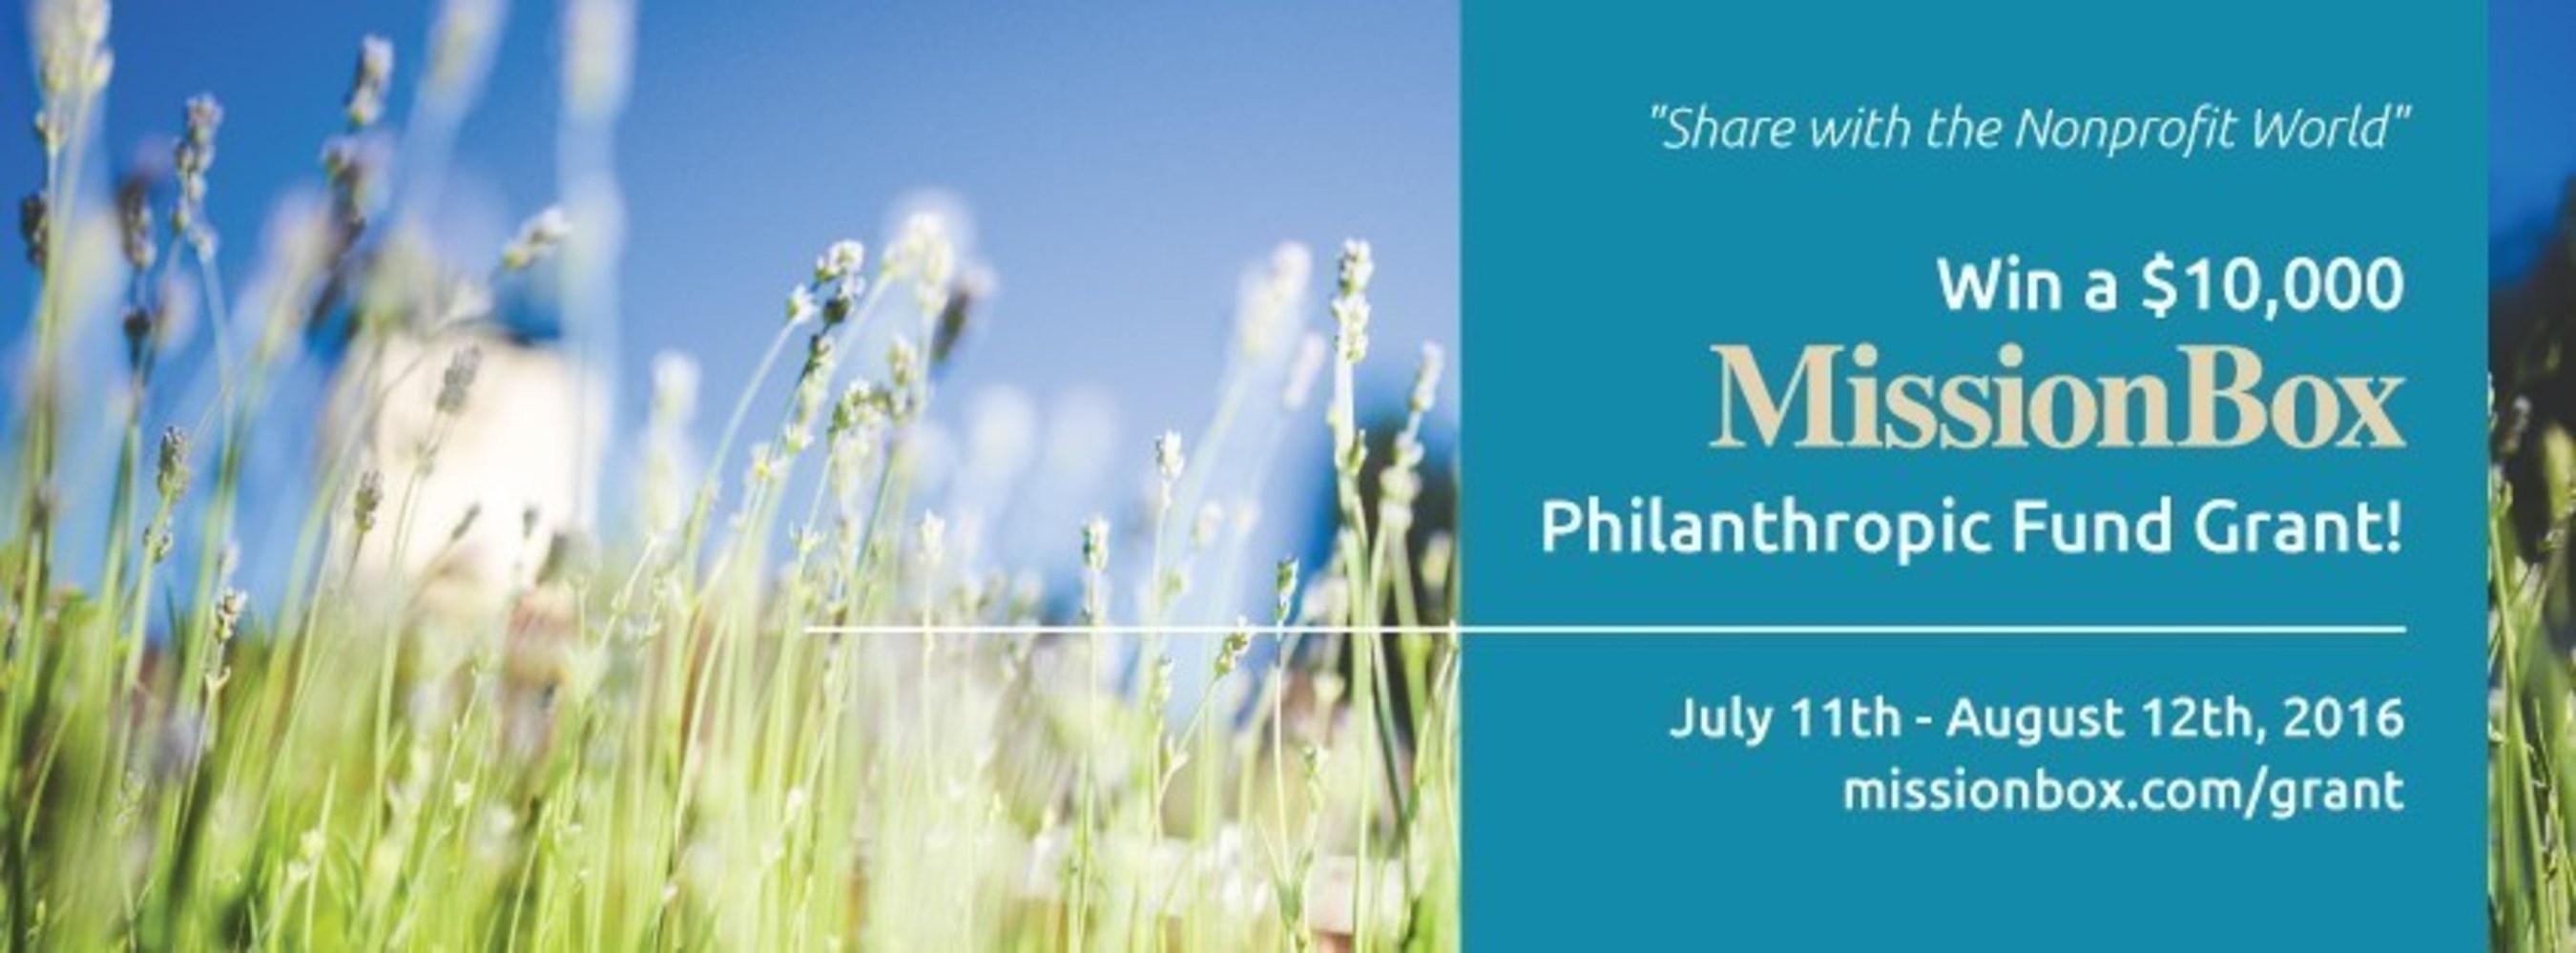 Win a $10,000 MissionBox Philanthropic Fund Grant #missionboxshare missionbox.com/grant